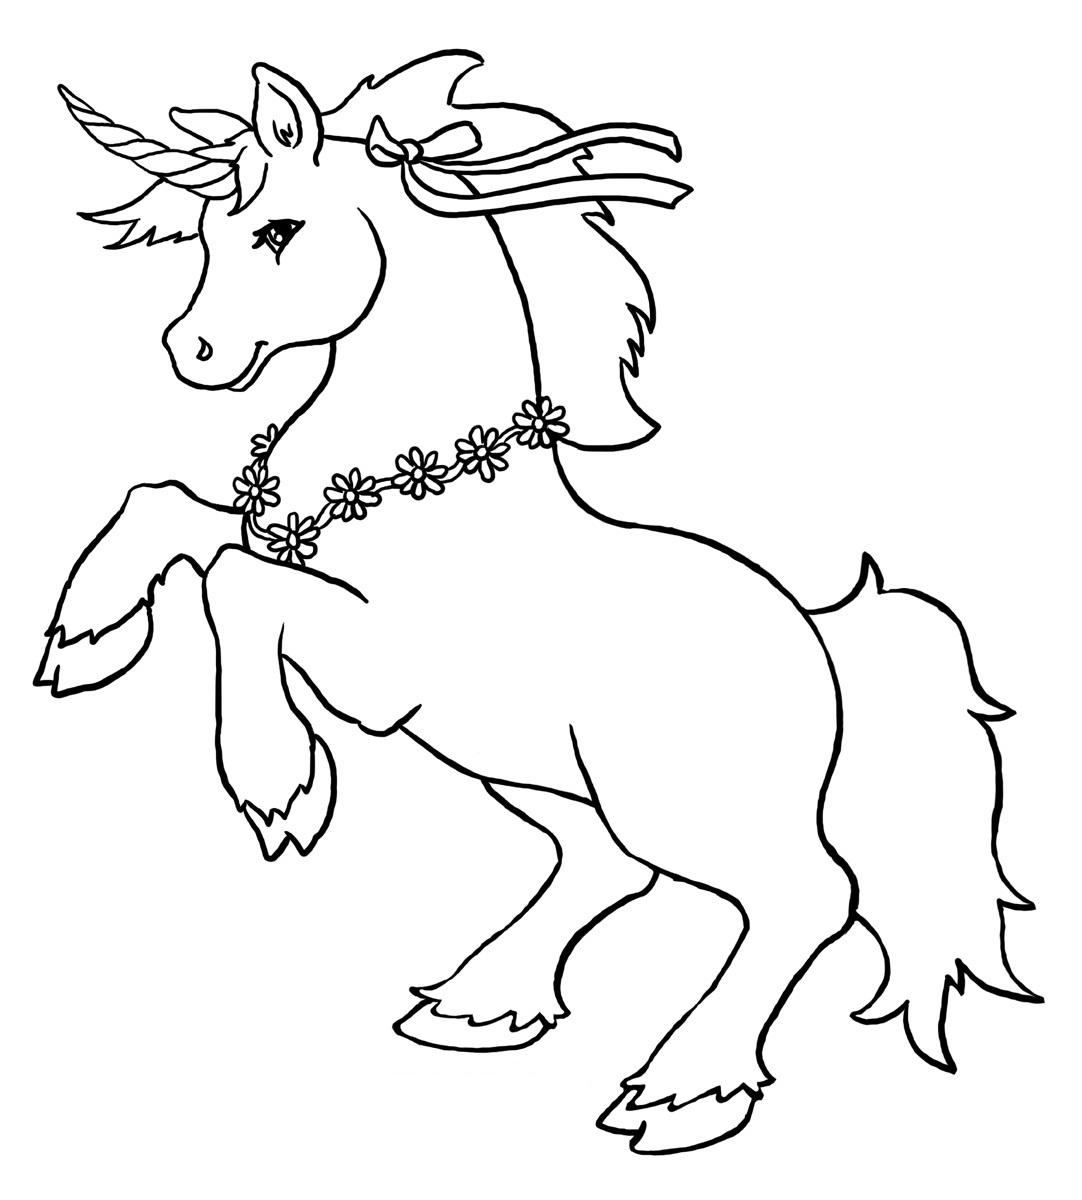 unicorn coloring page free printable unicorn coloring pages for kids page unicorn coloring